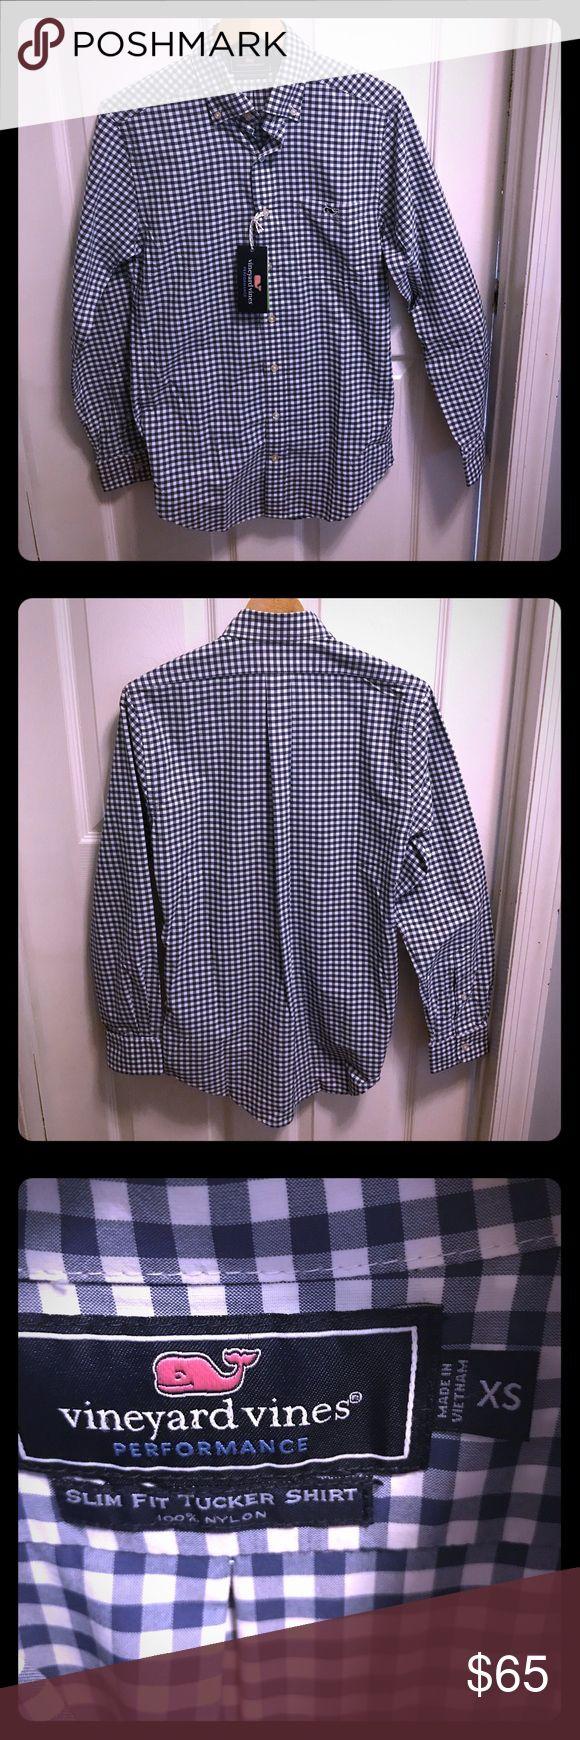 Selling this NWT Vineyard Vines shirt, XS, checkered blue on Poshmark! My username is: itsmebg. #shopmycloset #poshmark #fashion #shopping #style #forsale #Vineyard Vines #Other